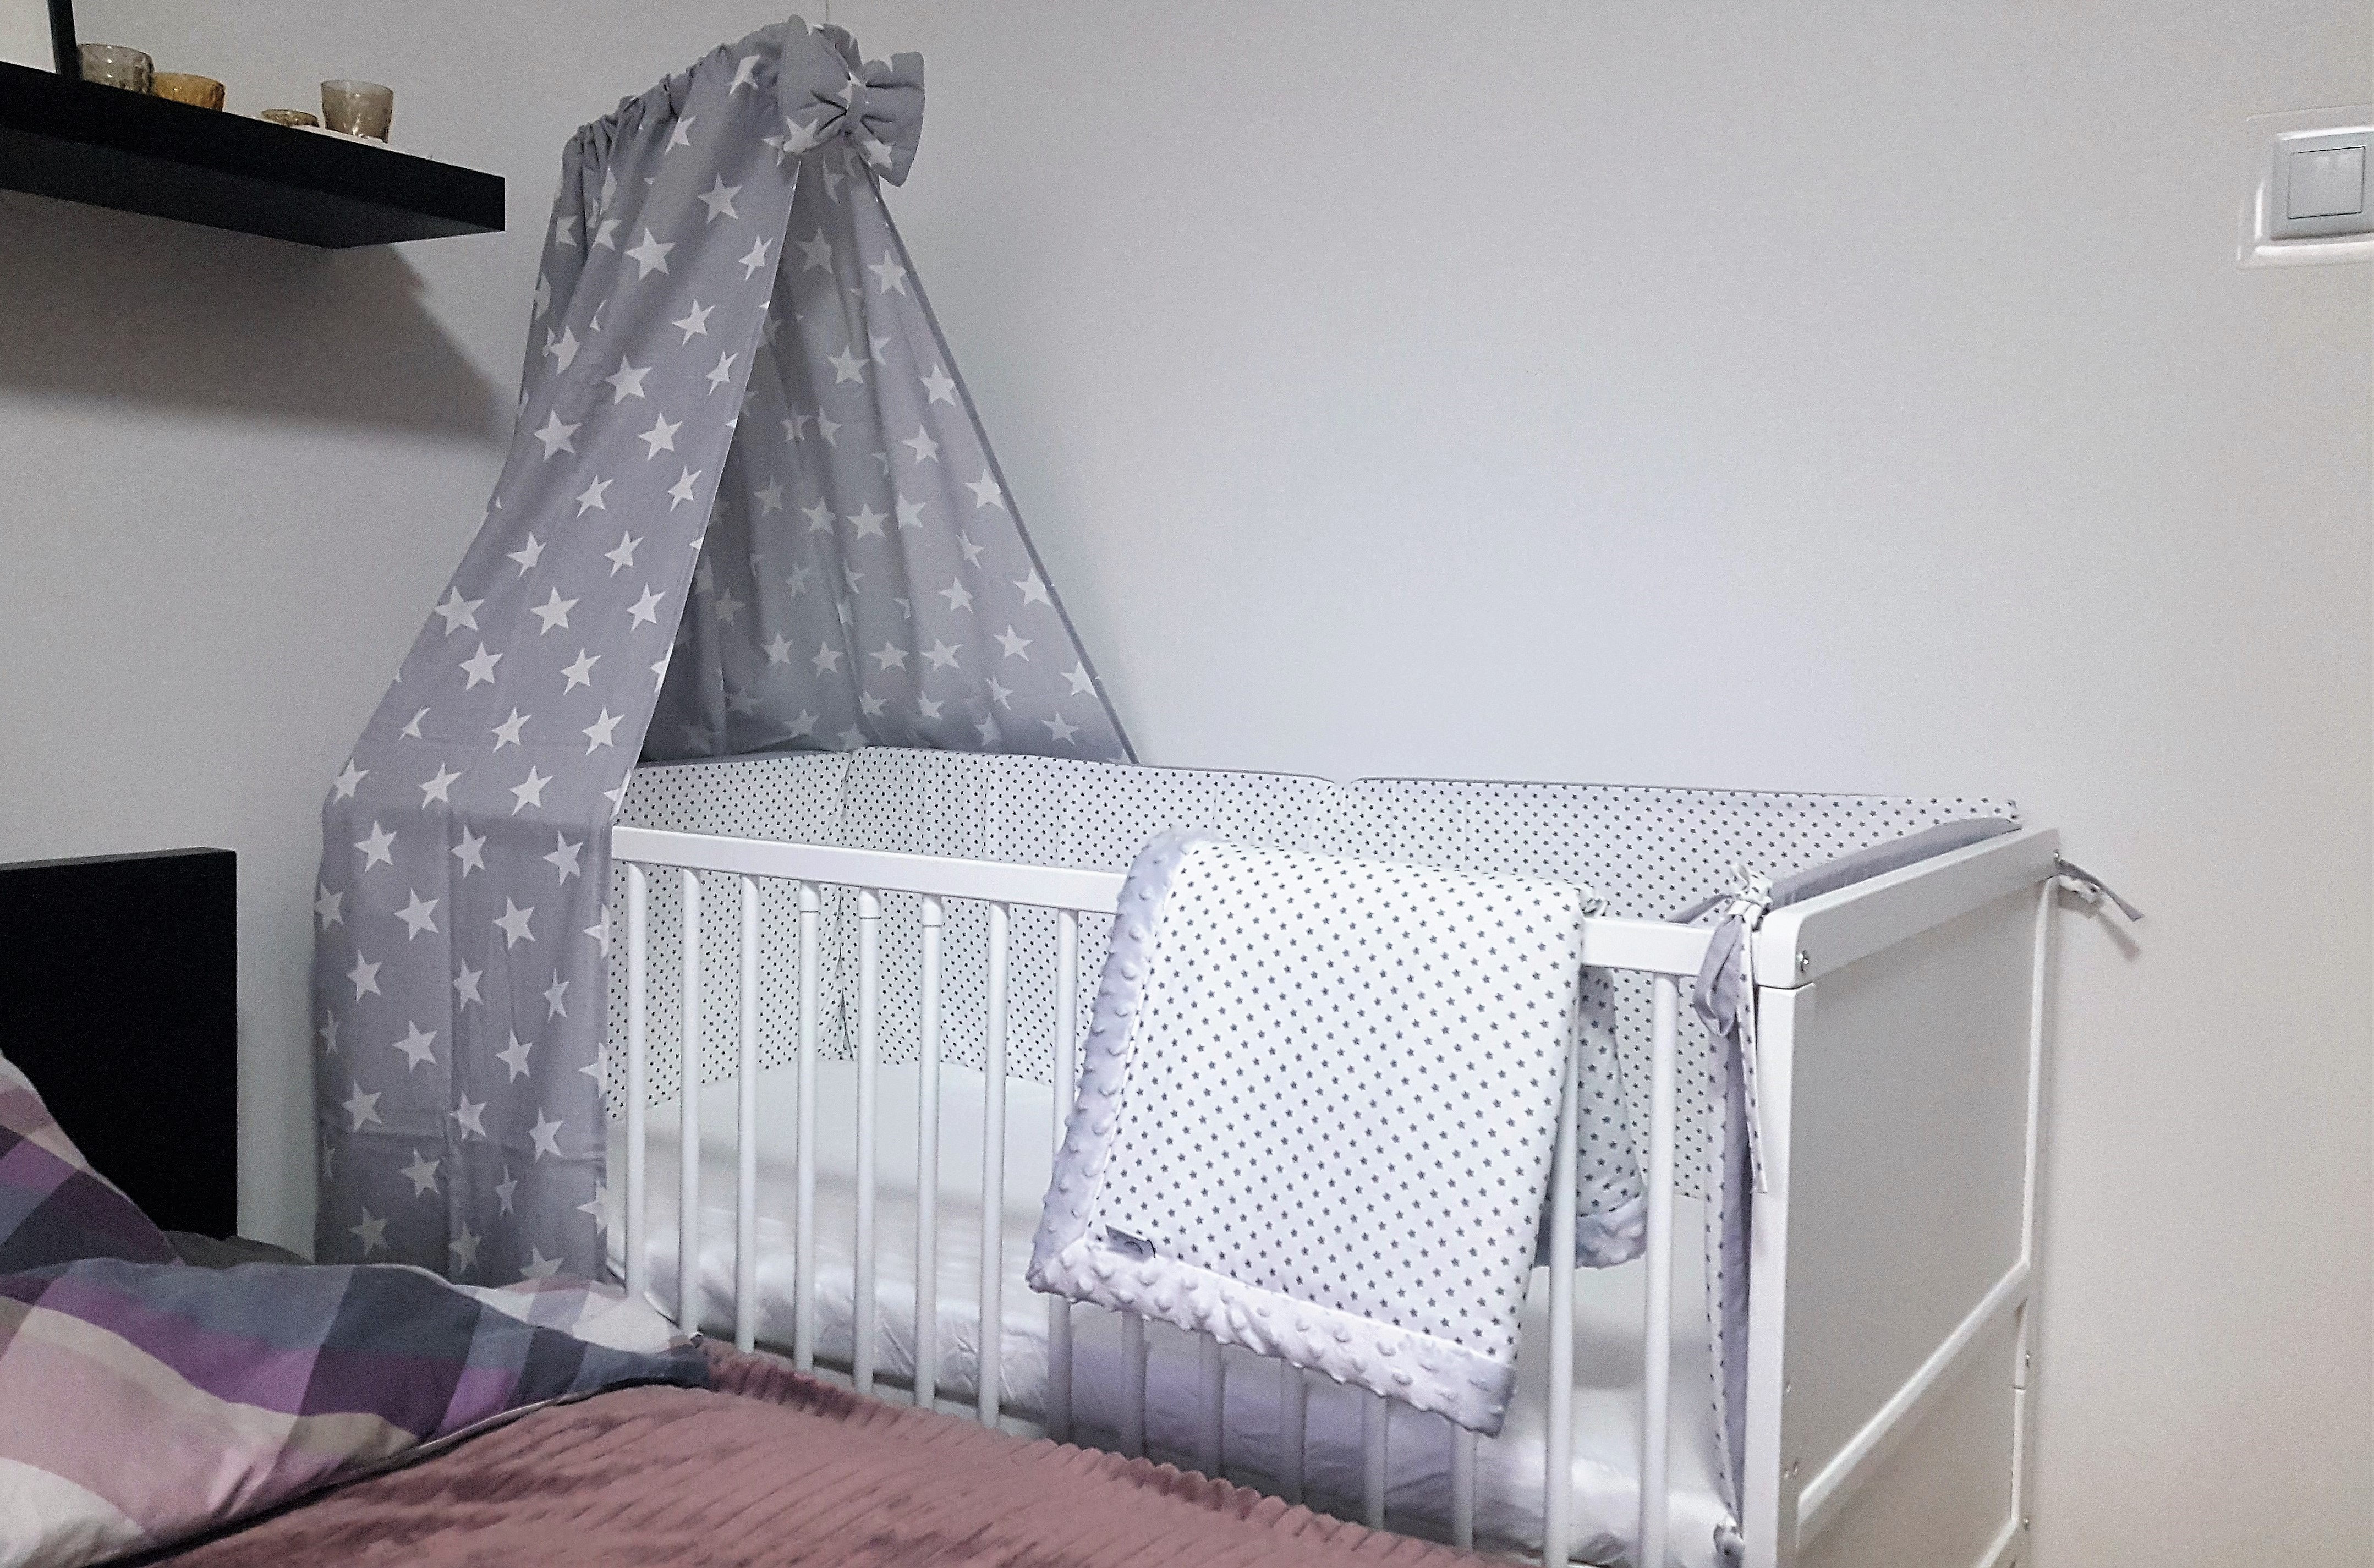 Kupili smo dječji krevetić